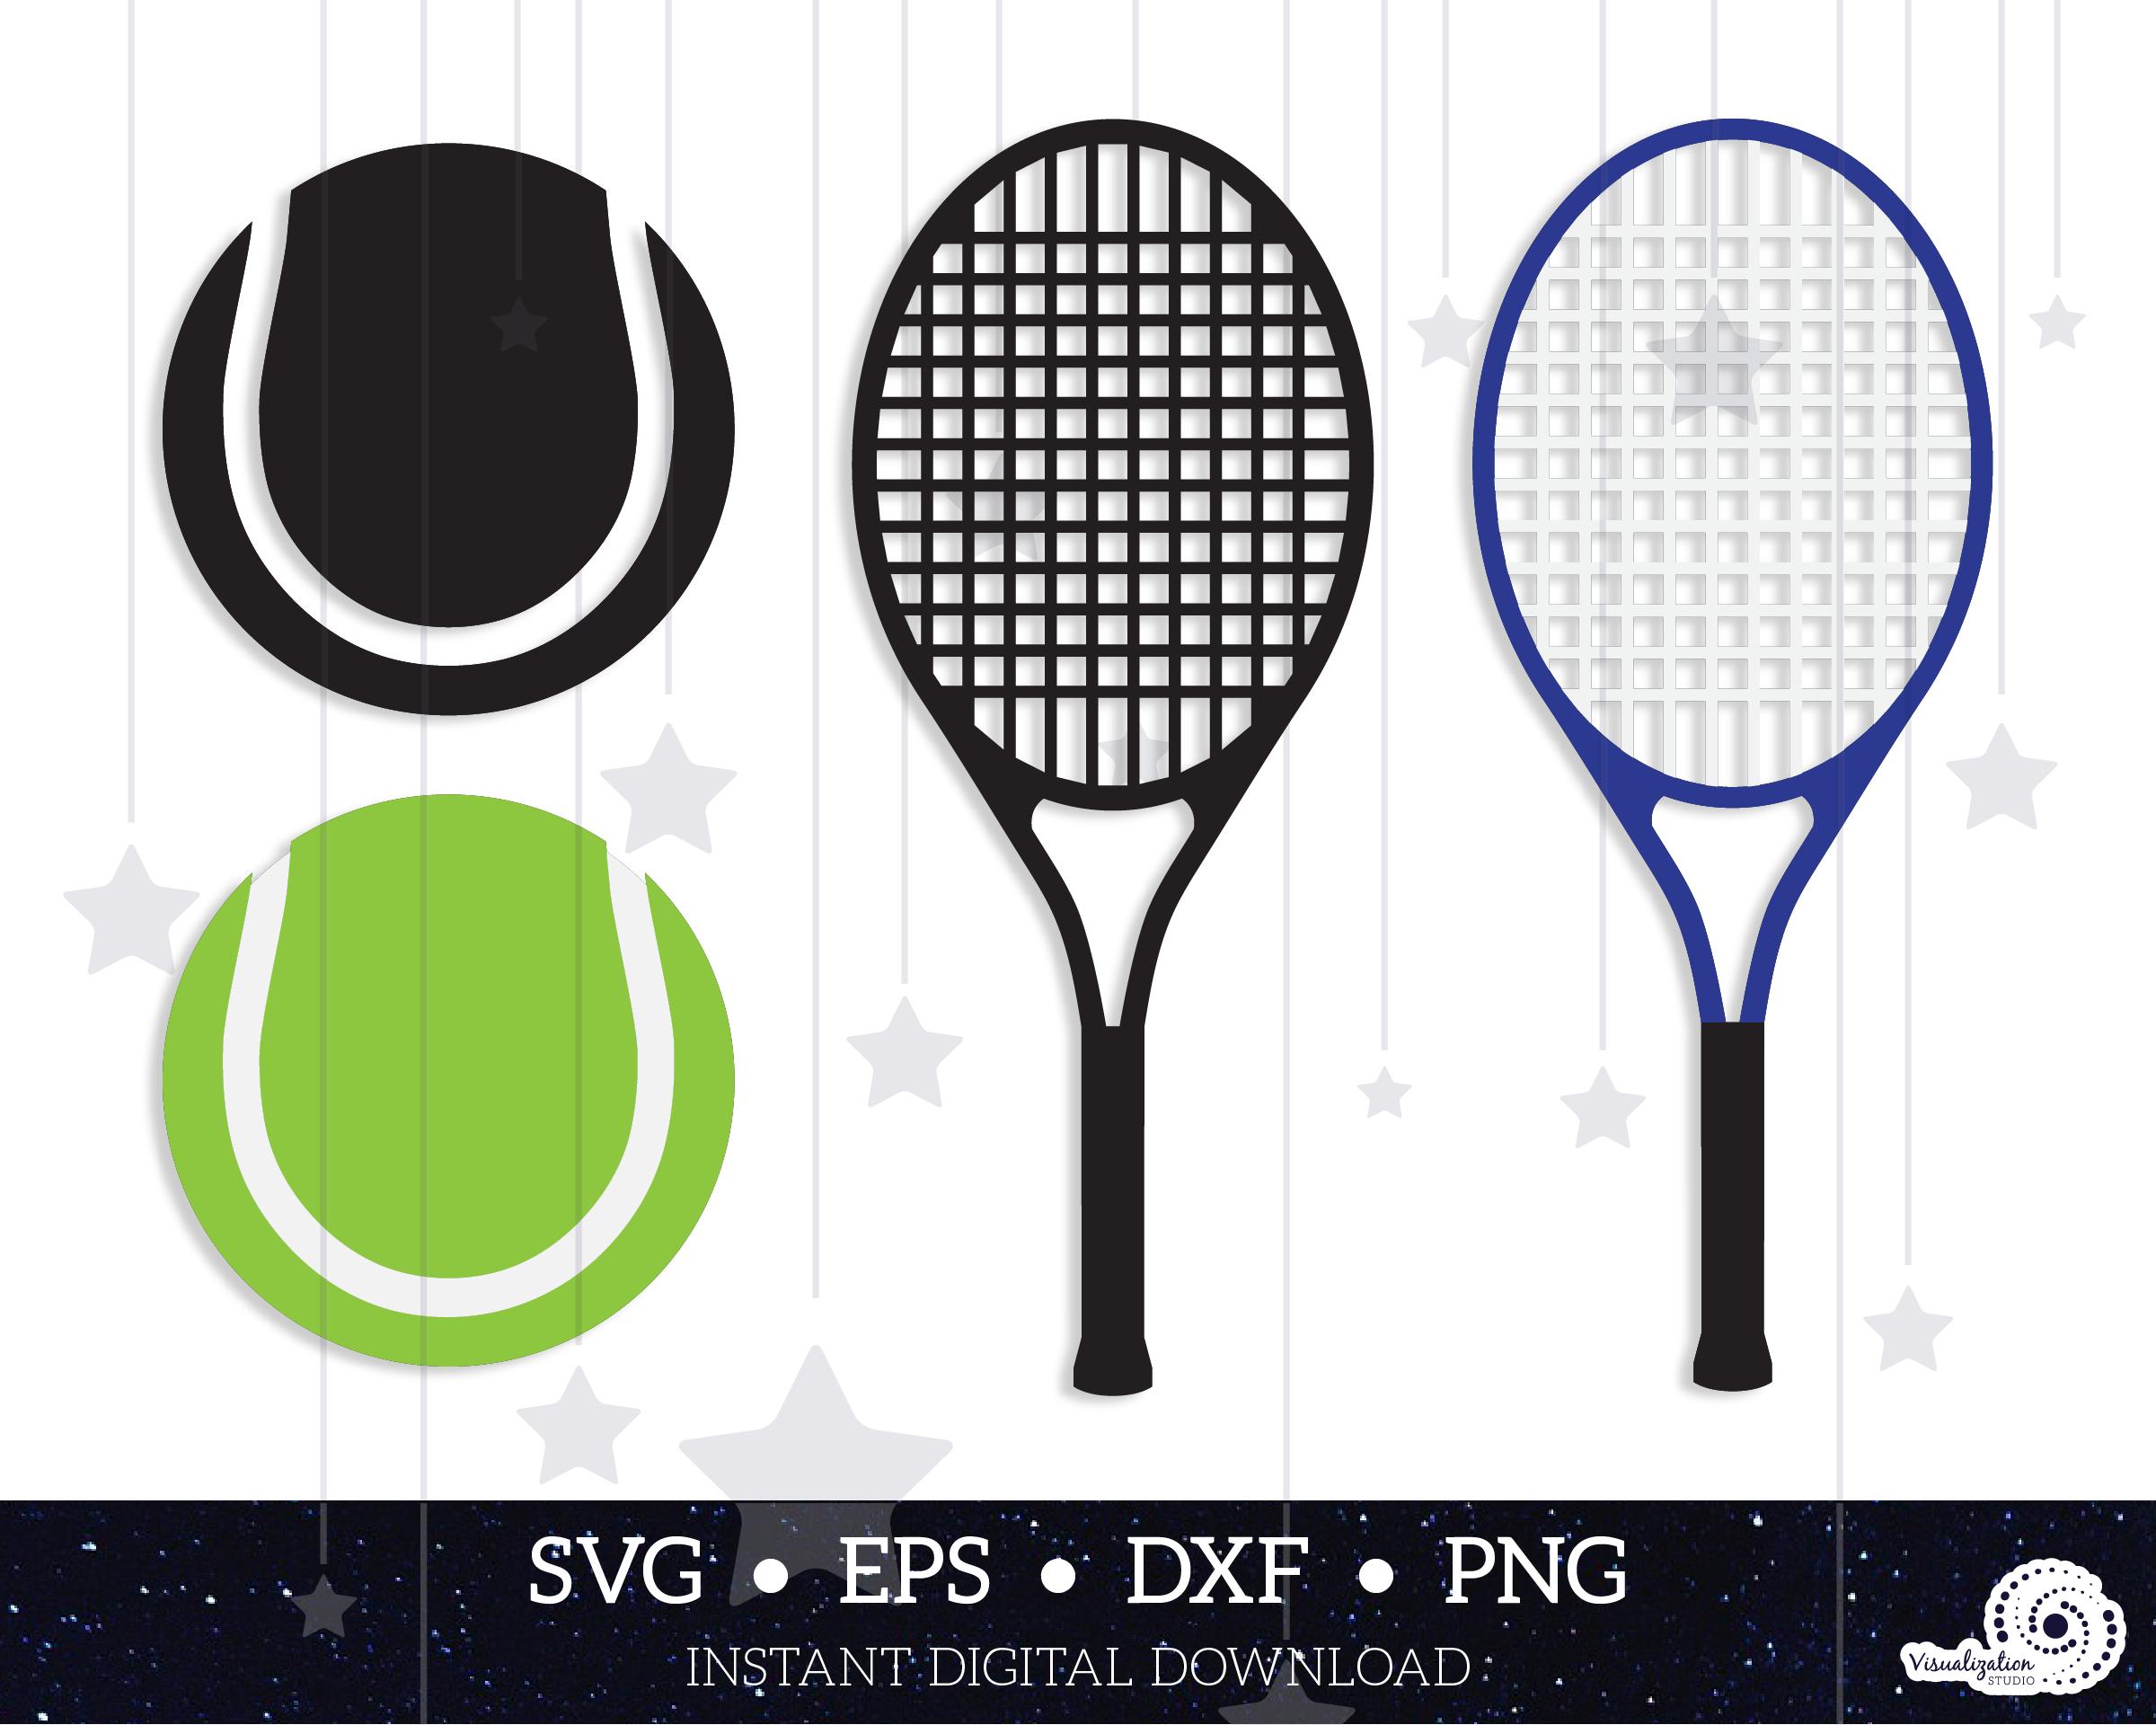 Tennis Ball Racket Silhouette Instant Digital Download Etsy Digital Download Etsy Tennis Ball Dxf